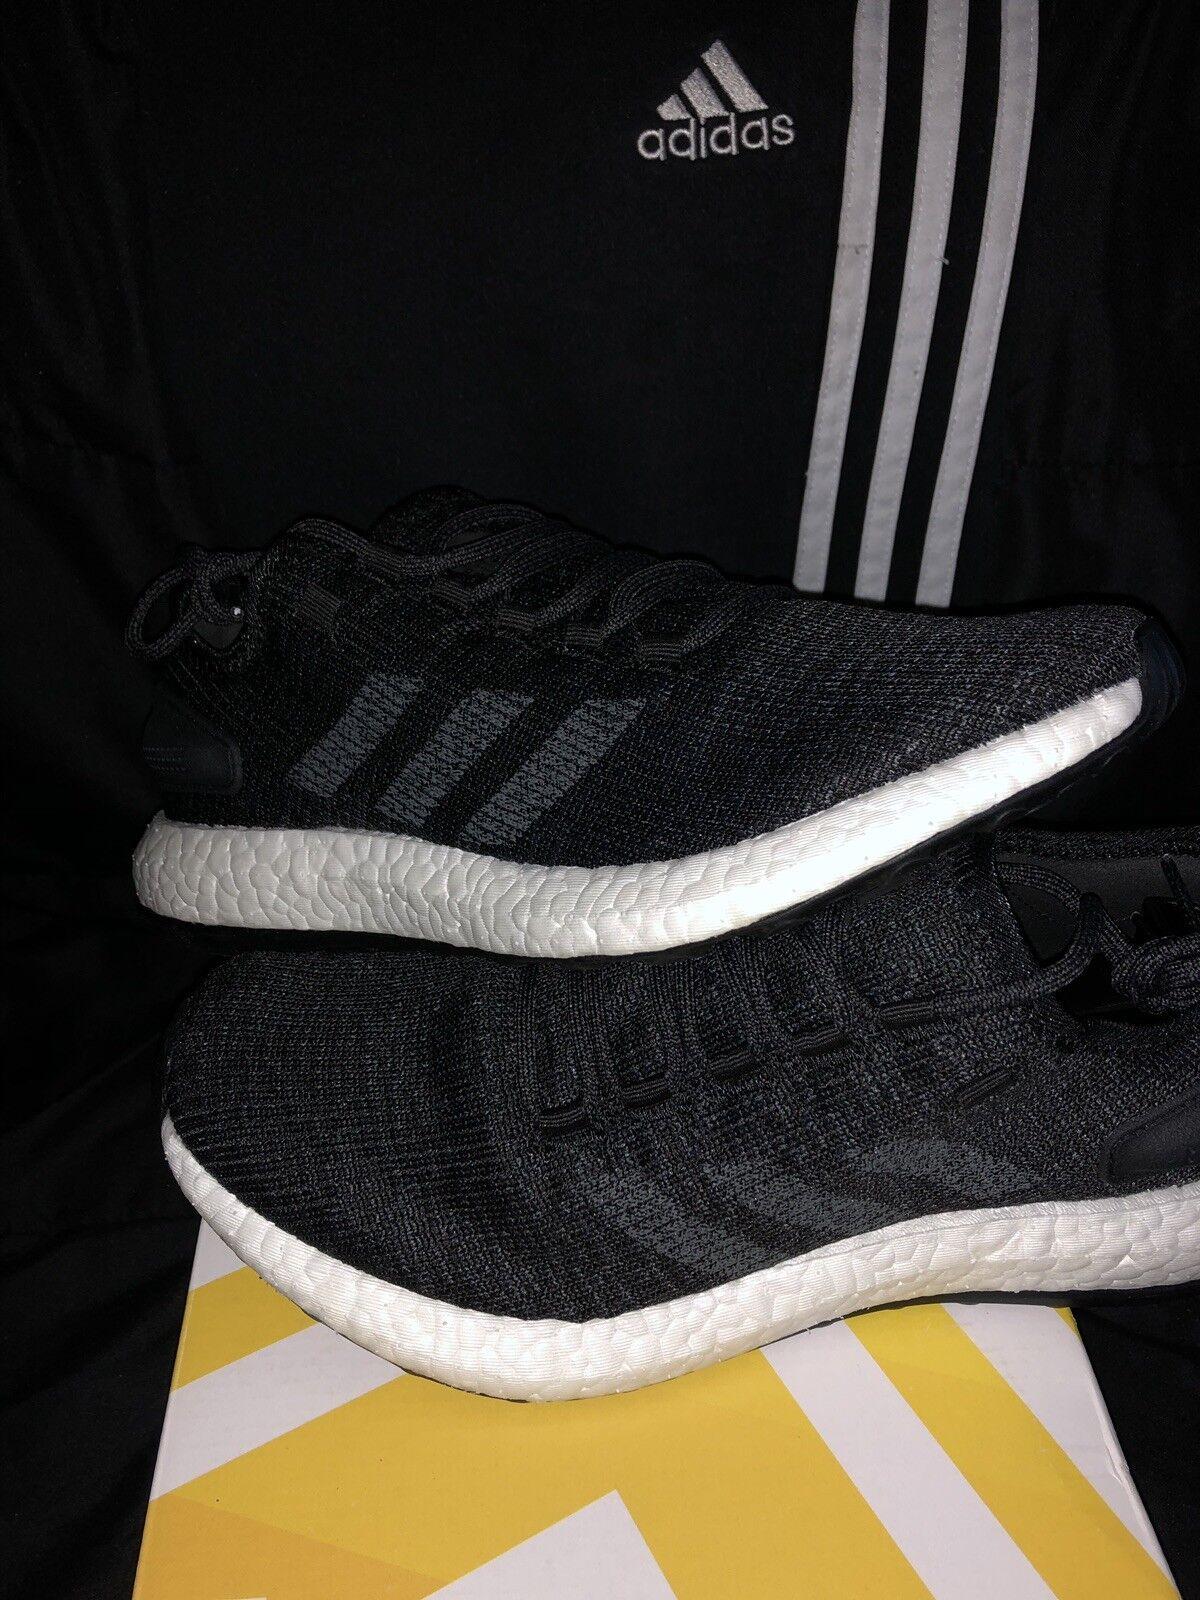 New Adidas PureBoost Men's Running Training shoes Mens Size 8 BA8899